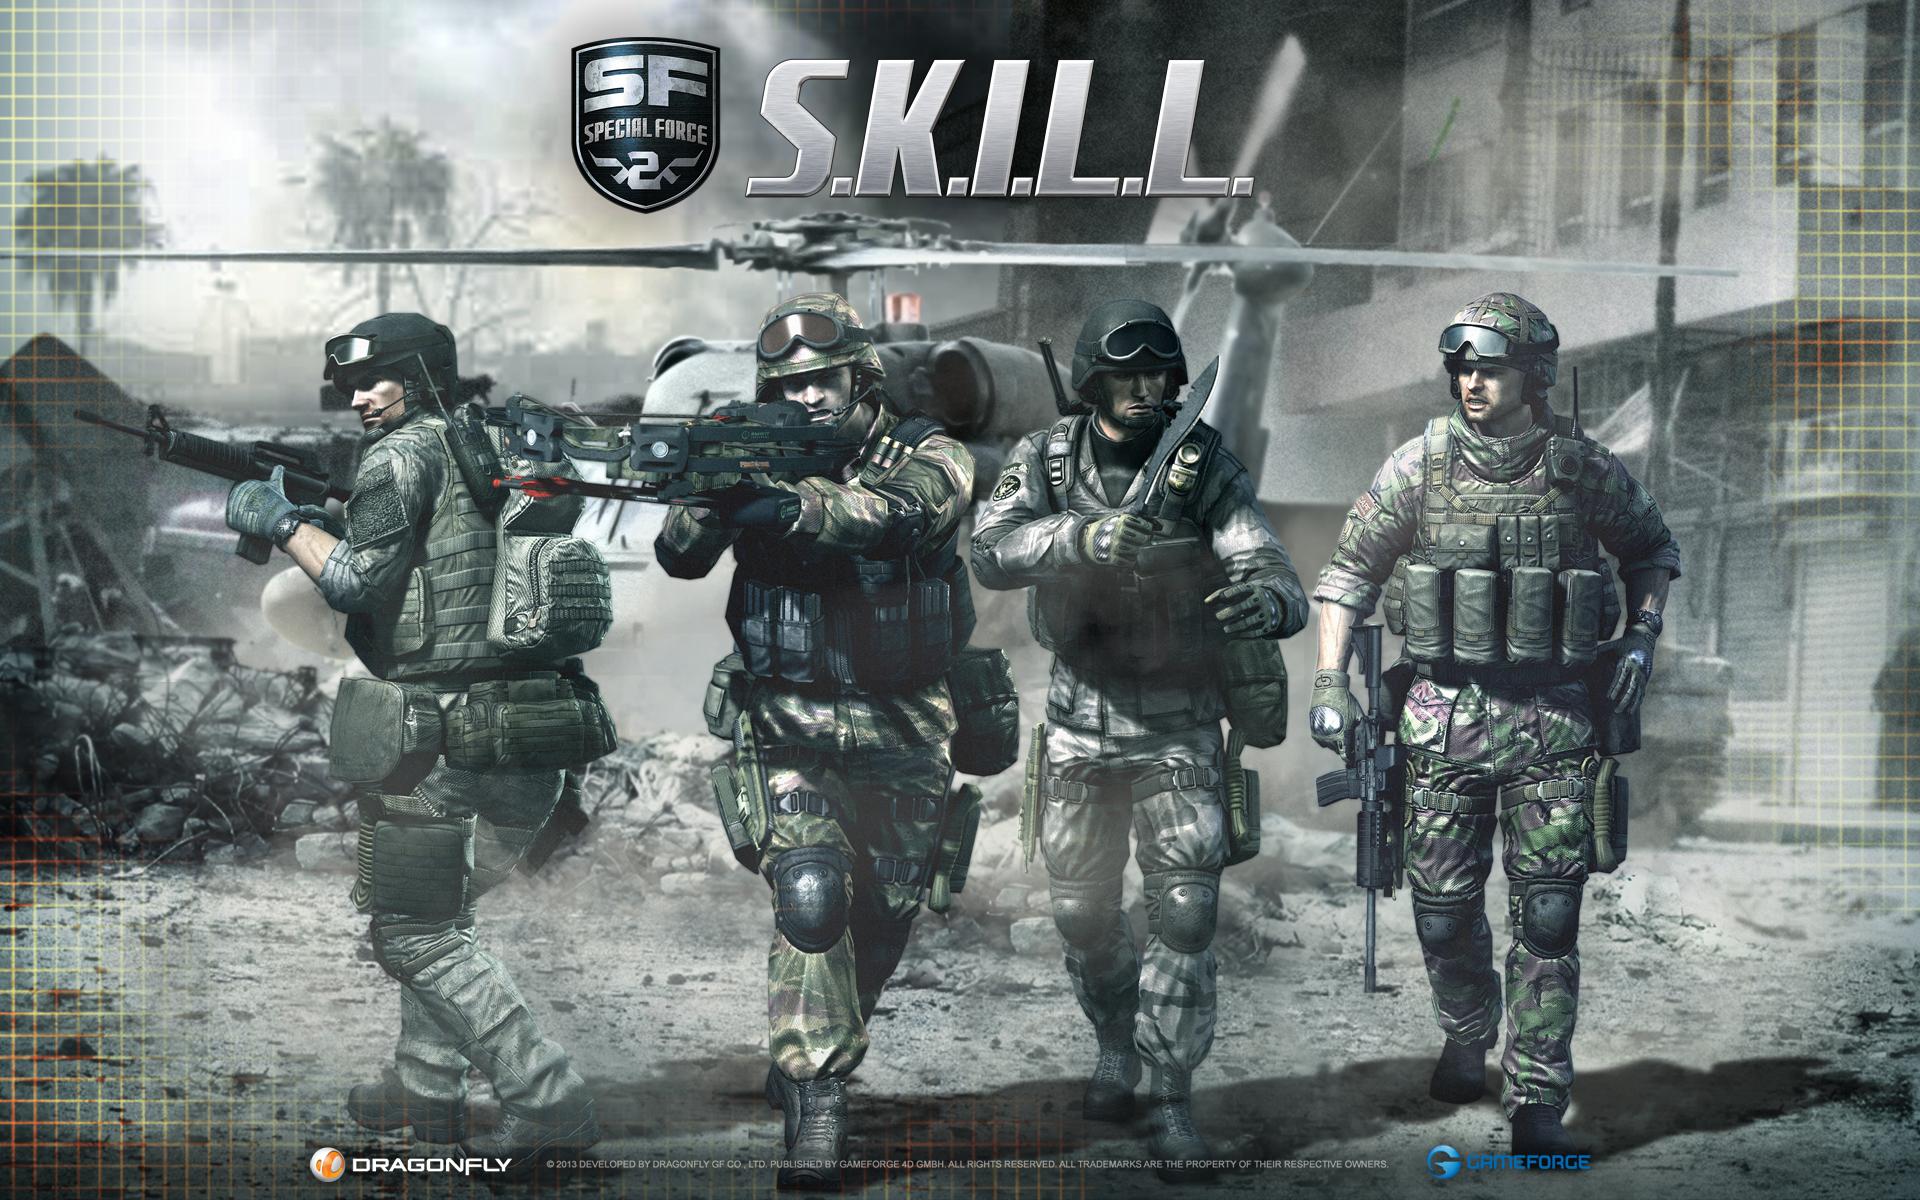 Скачать special forces group 2 3. 2 для android, iphone / ipad.